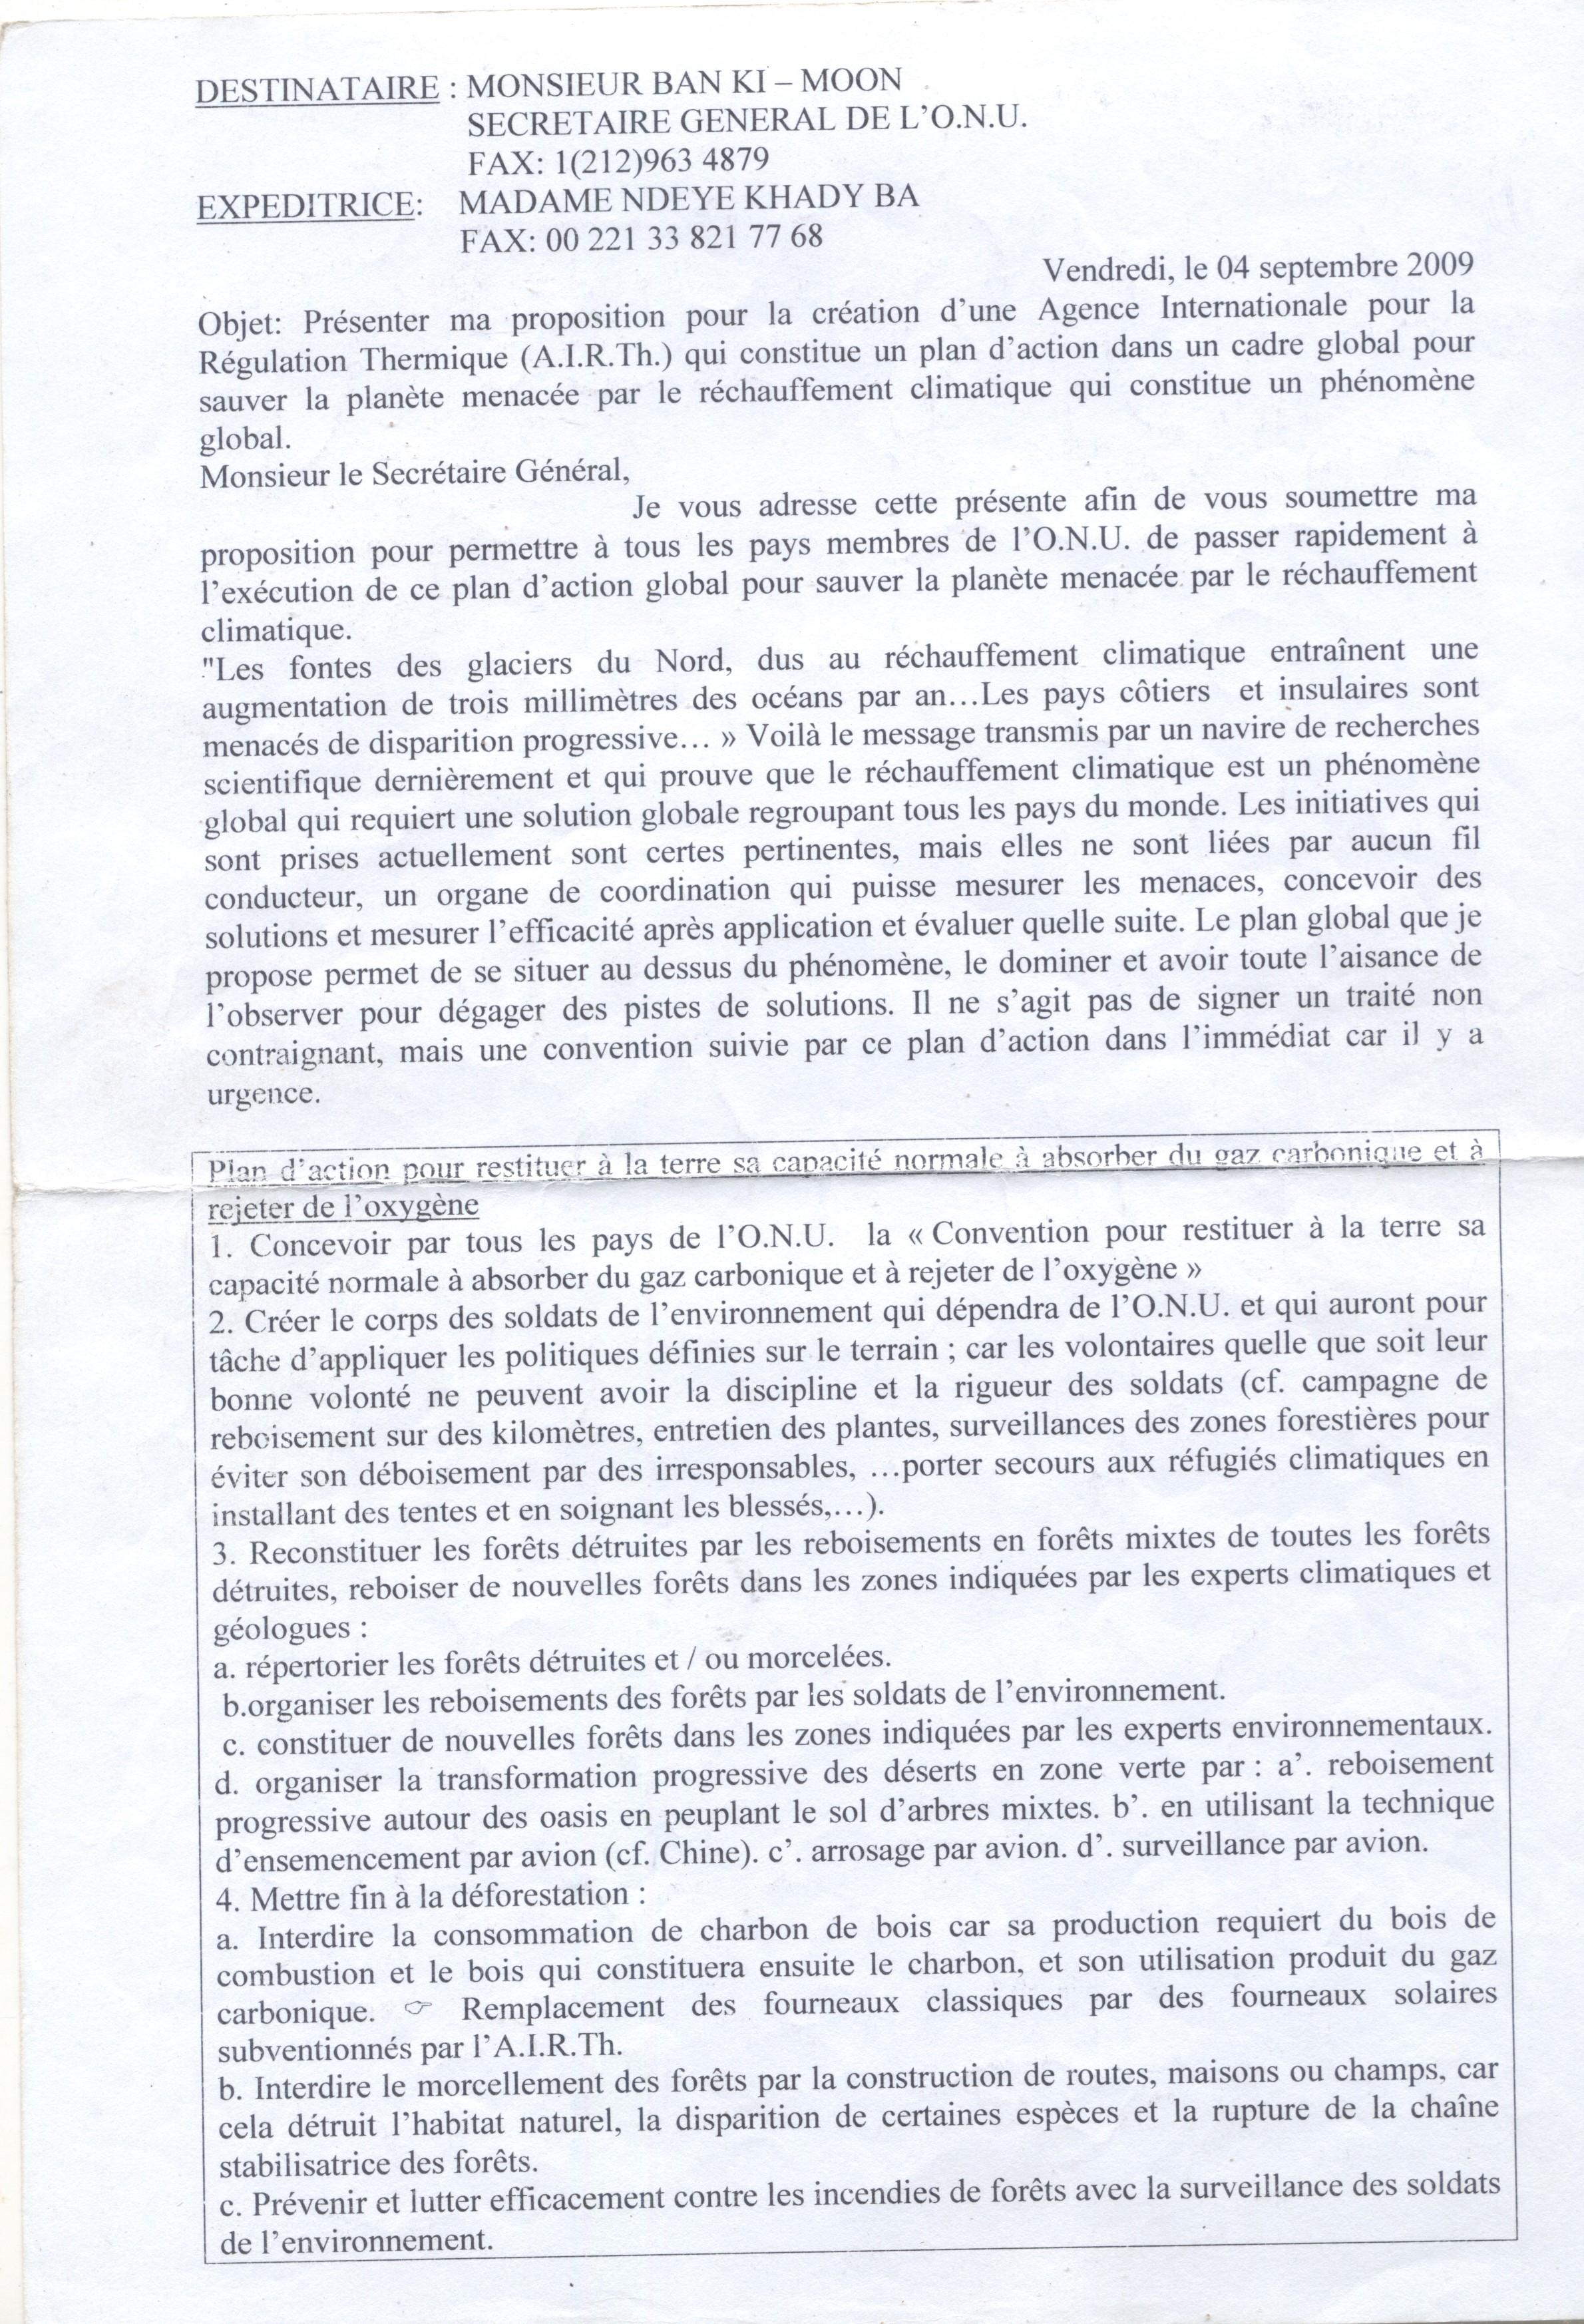 sanstitrenumrisation021.jpg